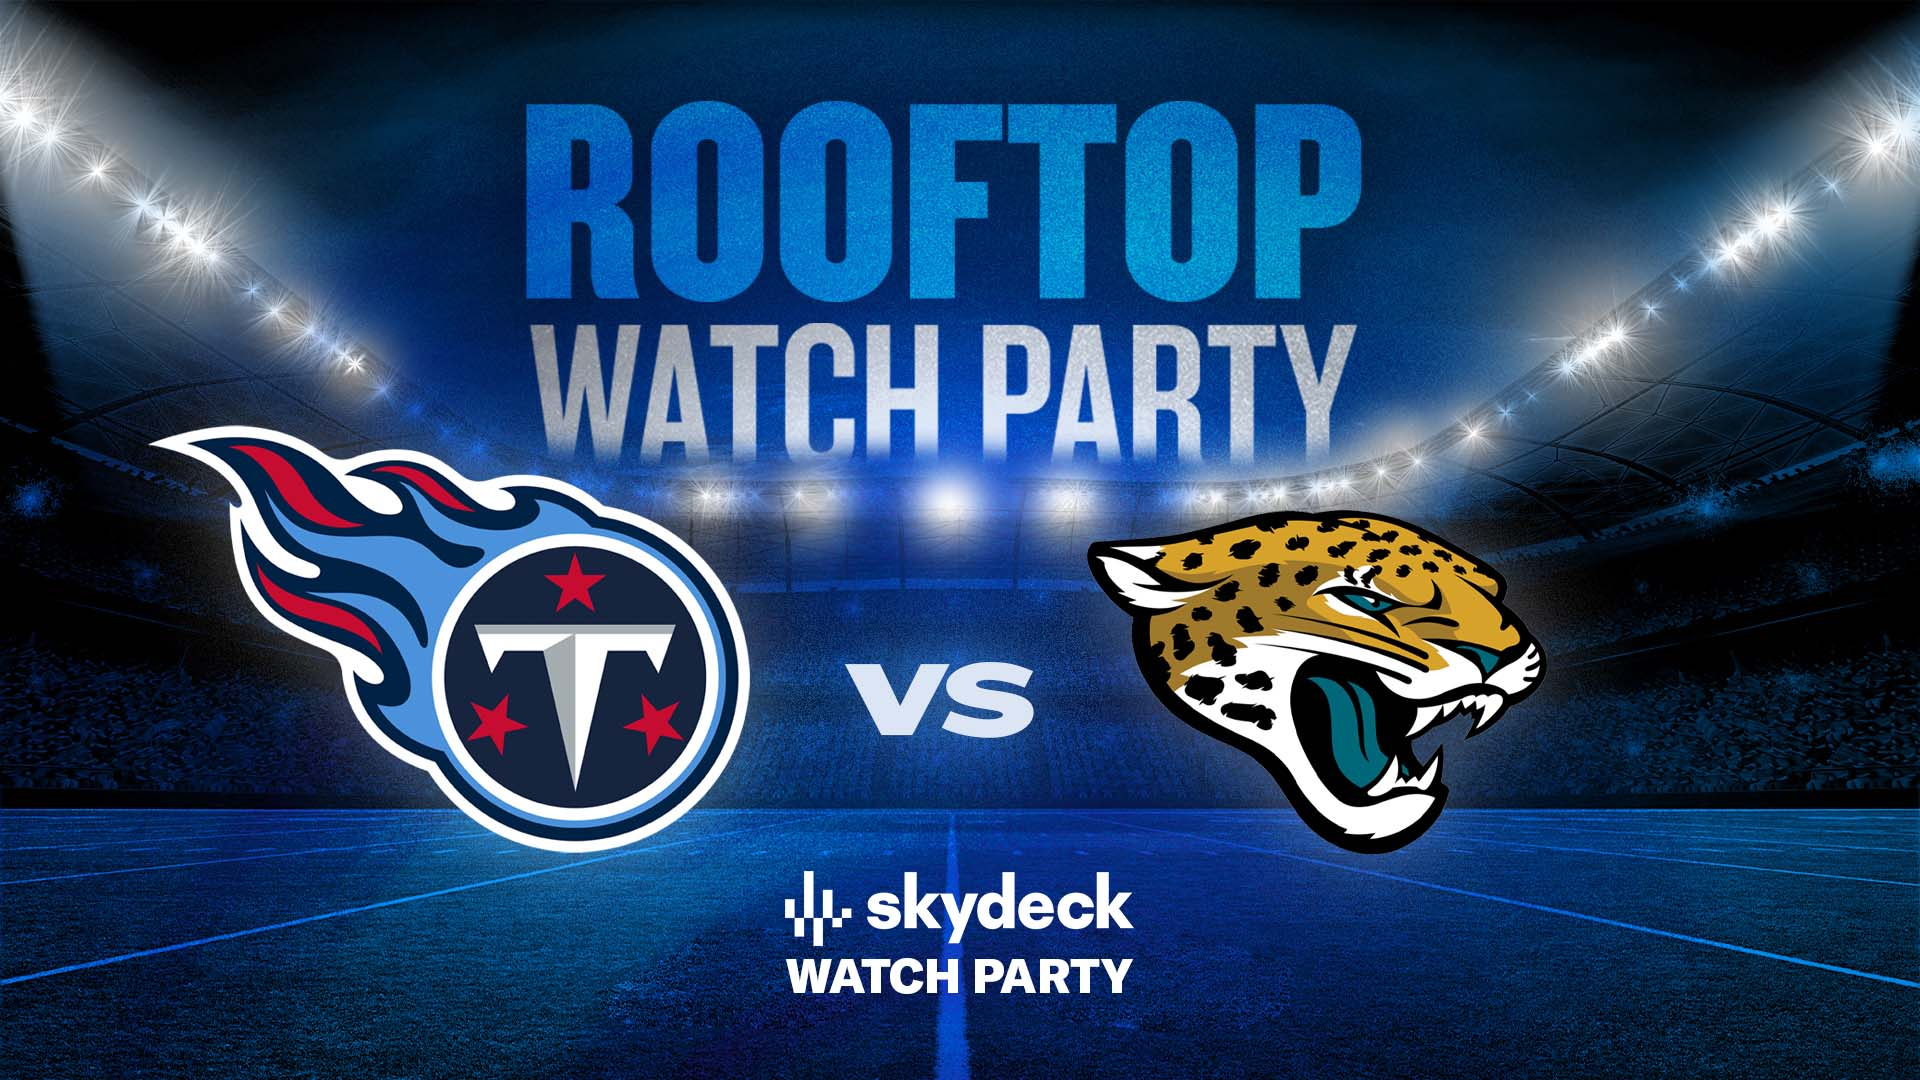 Promo image of Titans vs. Jaguars Skydeck Watch Party